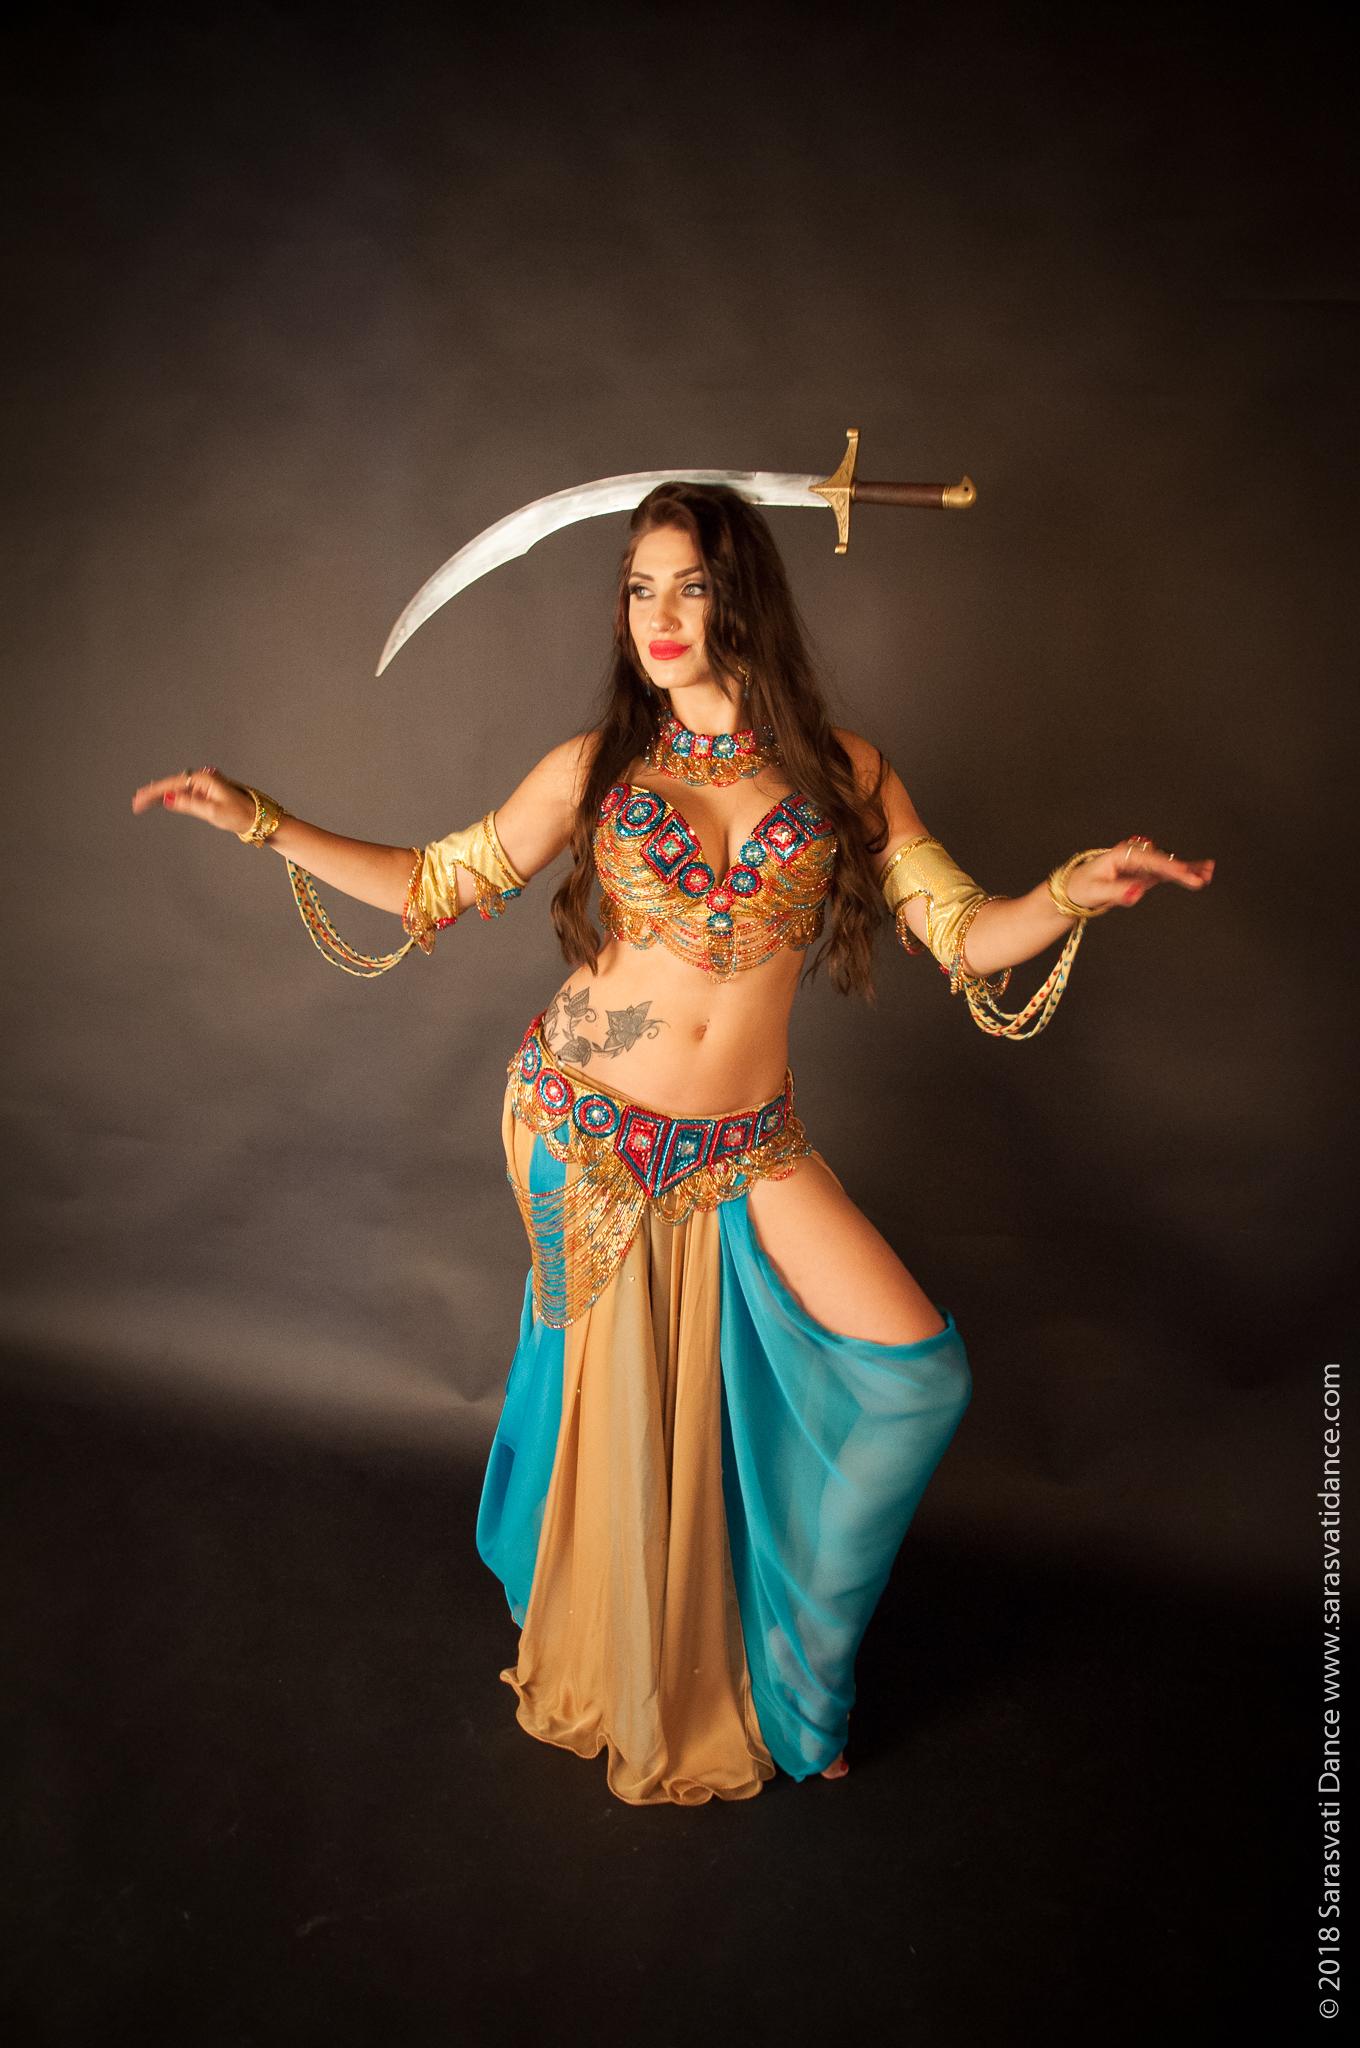 Sarasvati Dance undefined classes in London